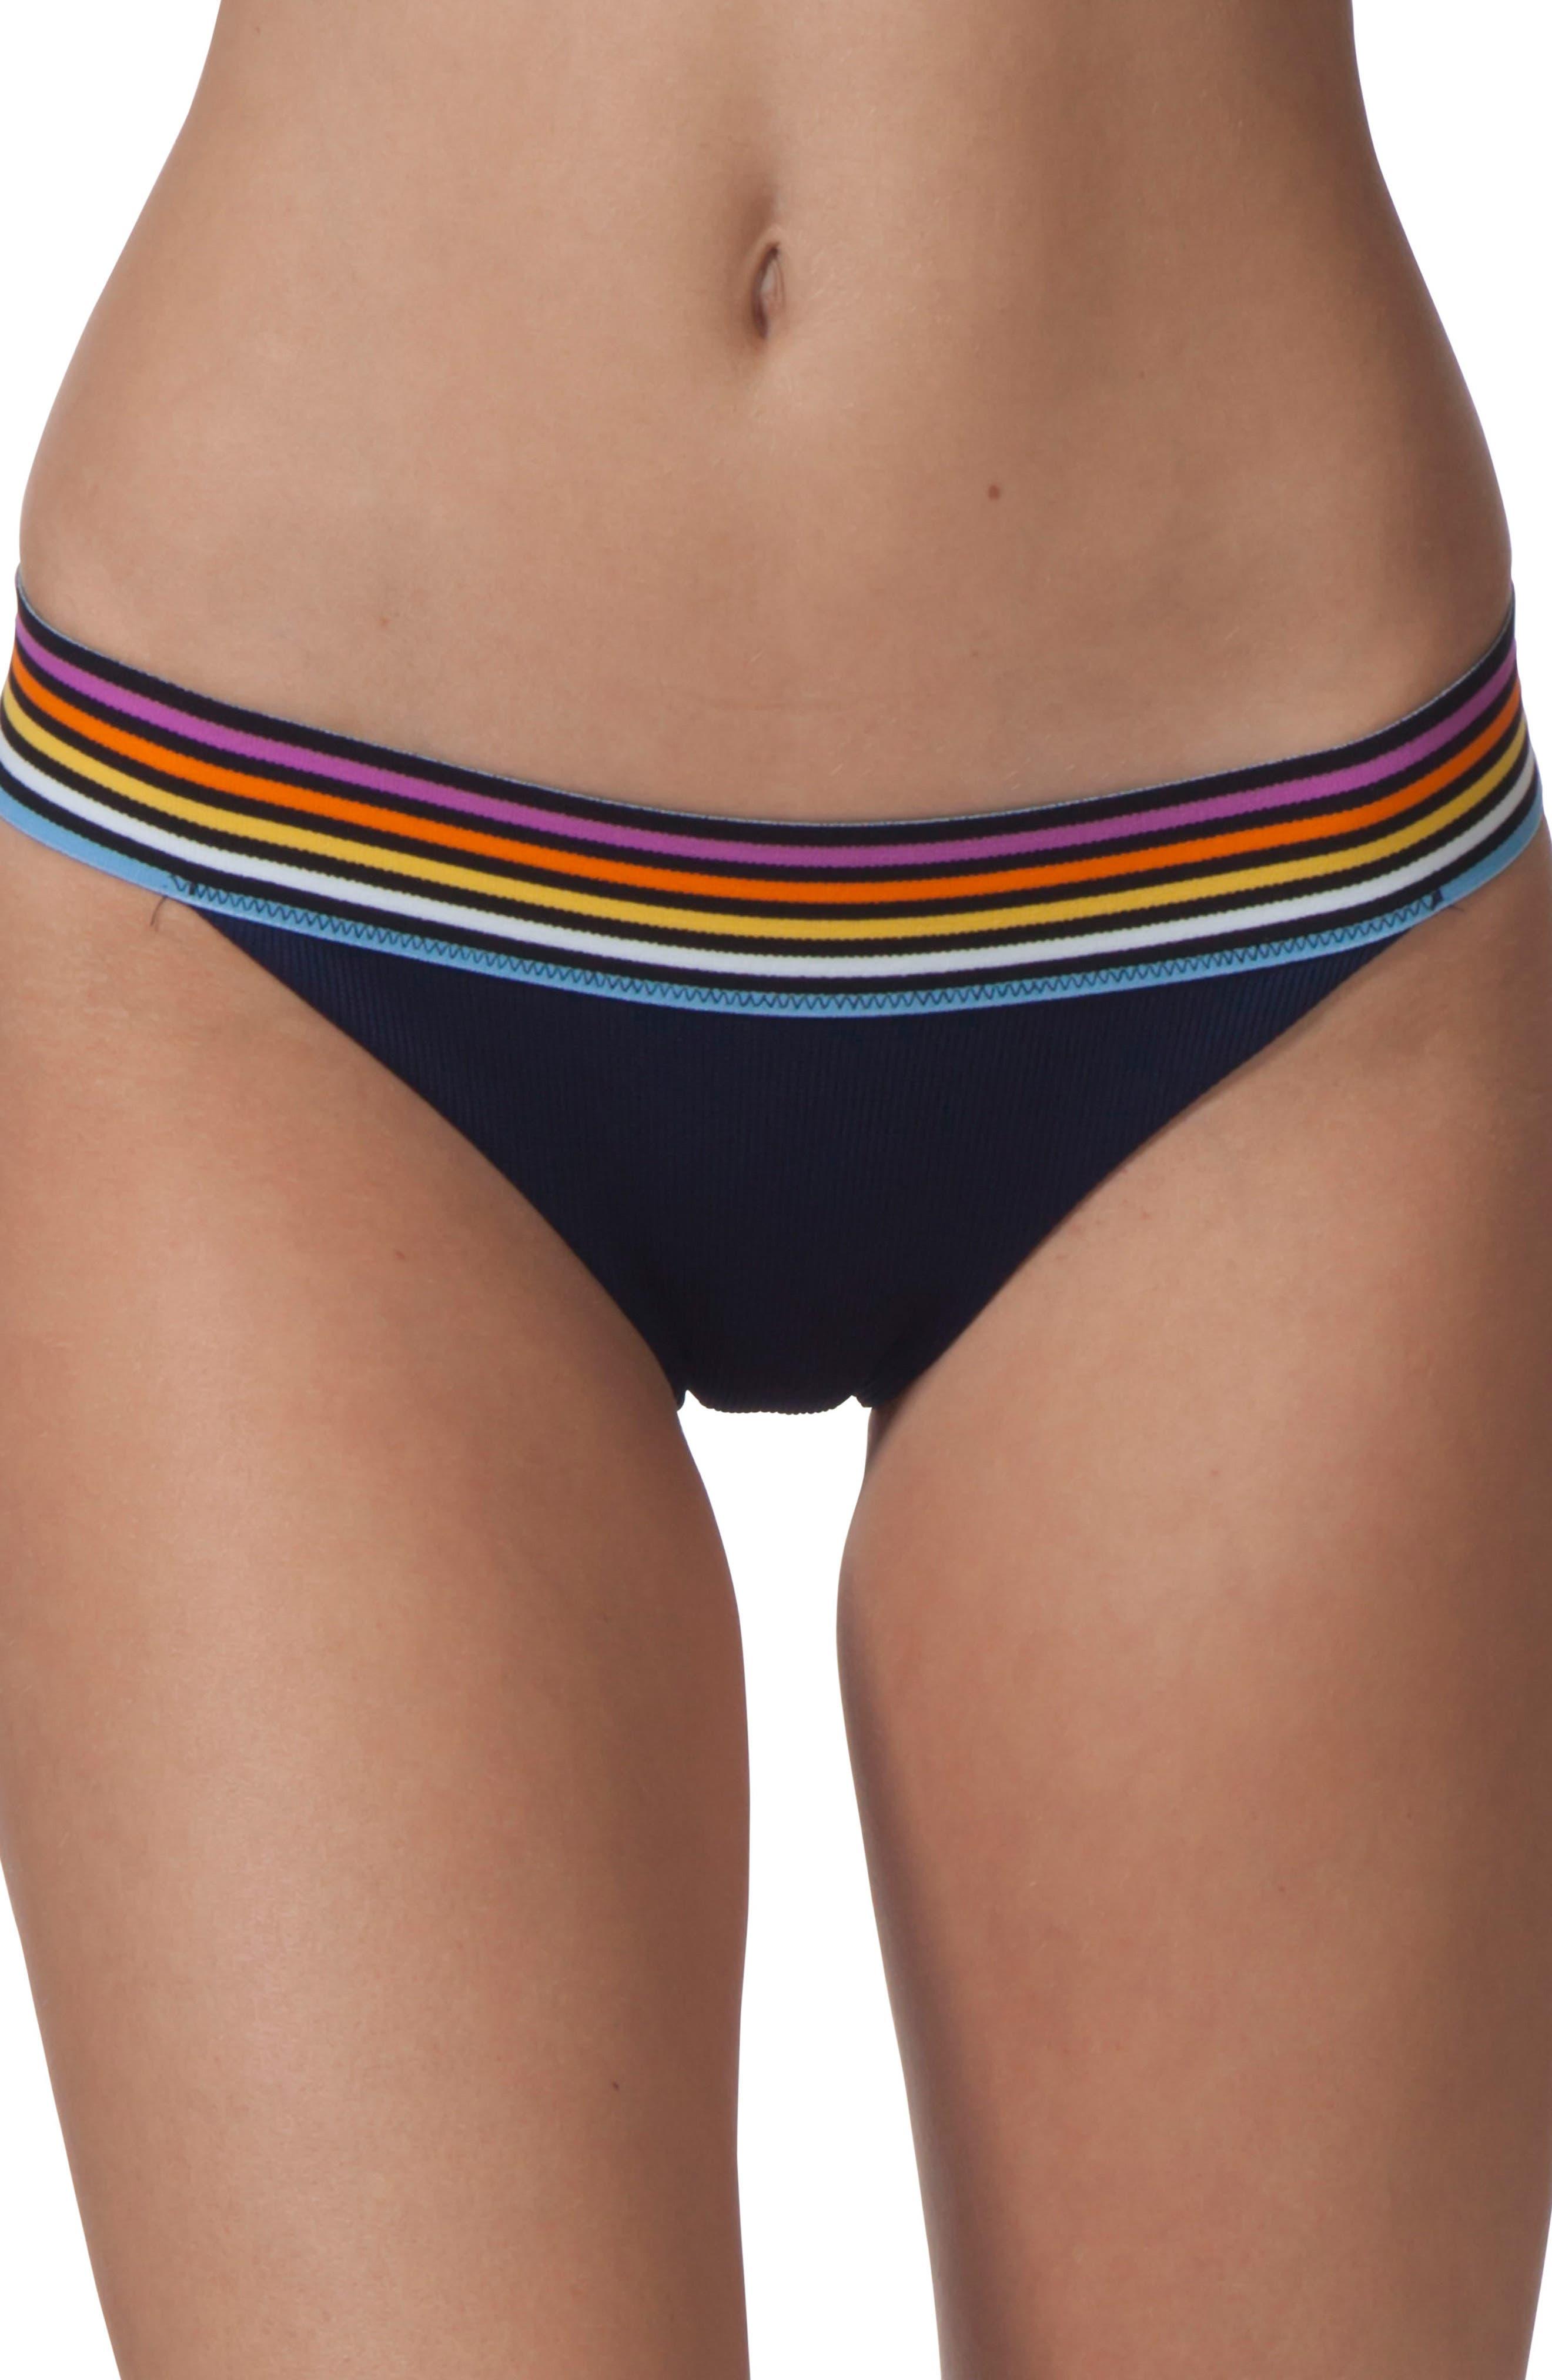 Surforama Hipster Bikini Bottoms,                             Main thumbnail 1, color,